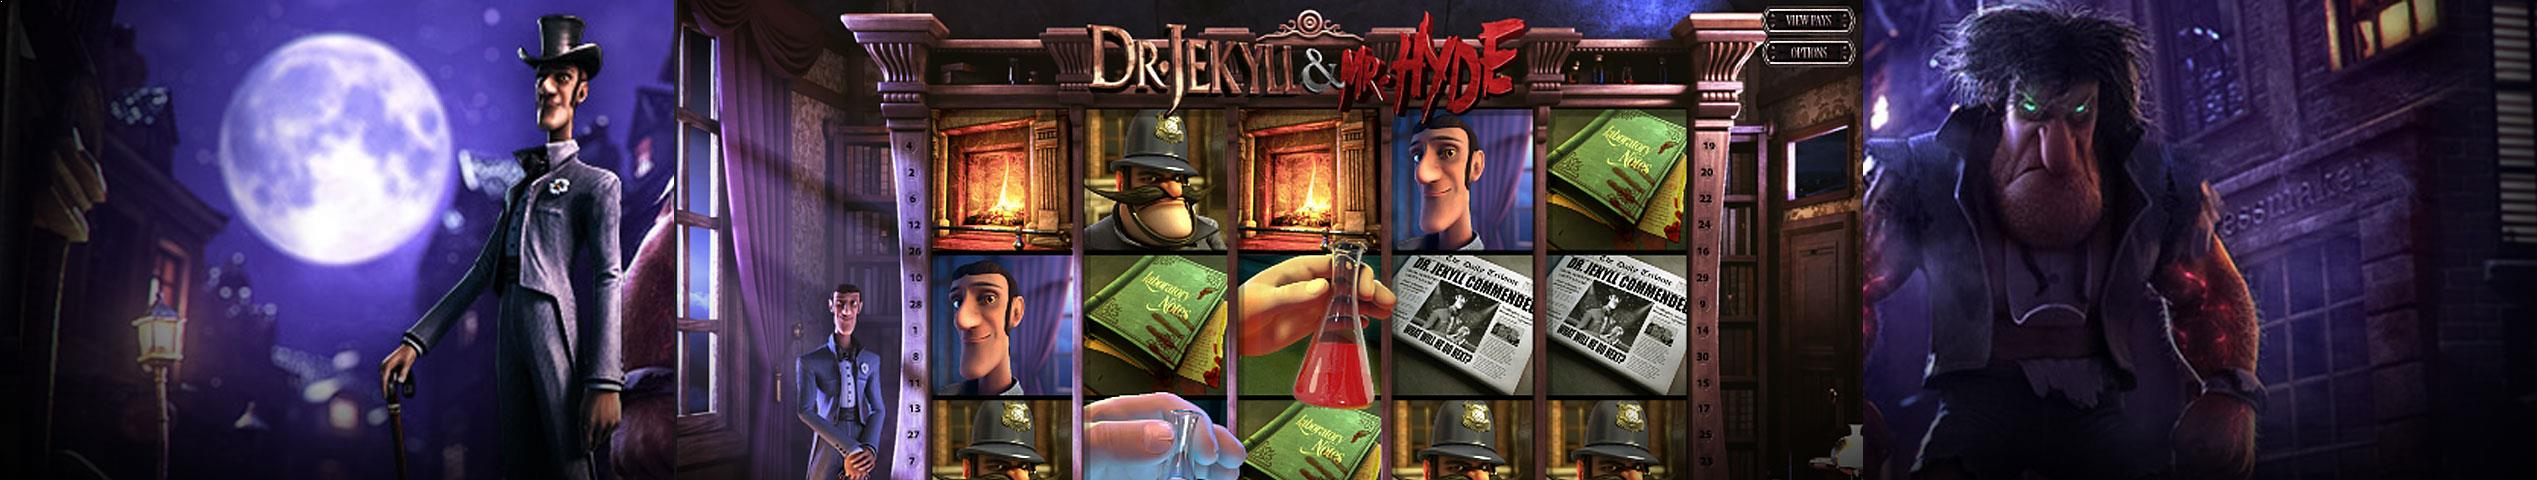 Dr. Jekyll Mr Hyde Multa Baft jocuri slot slider Betsoft